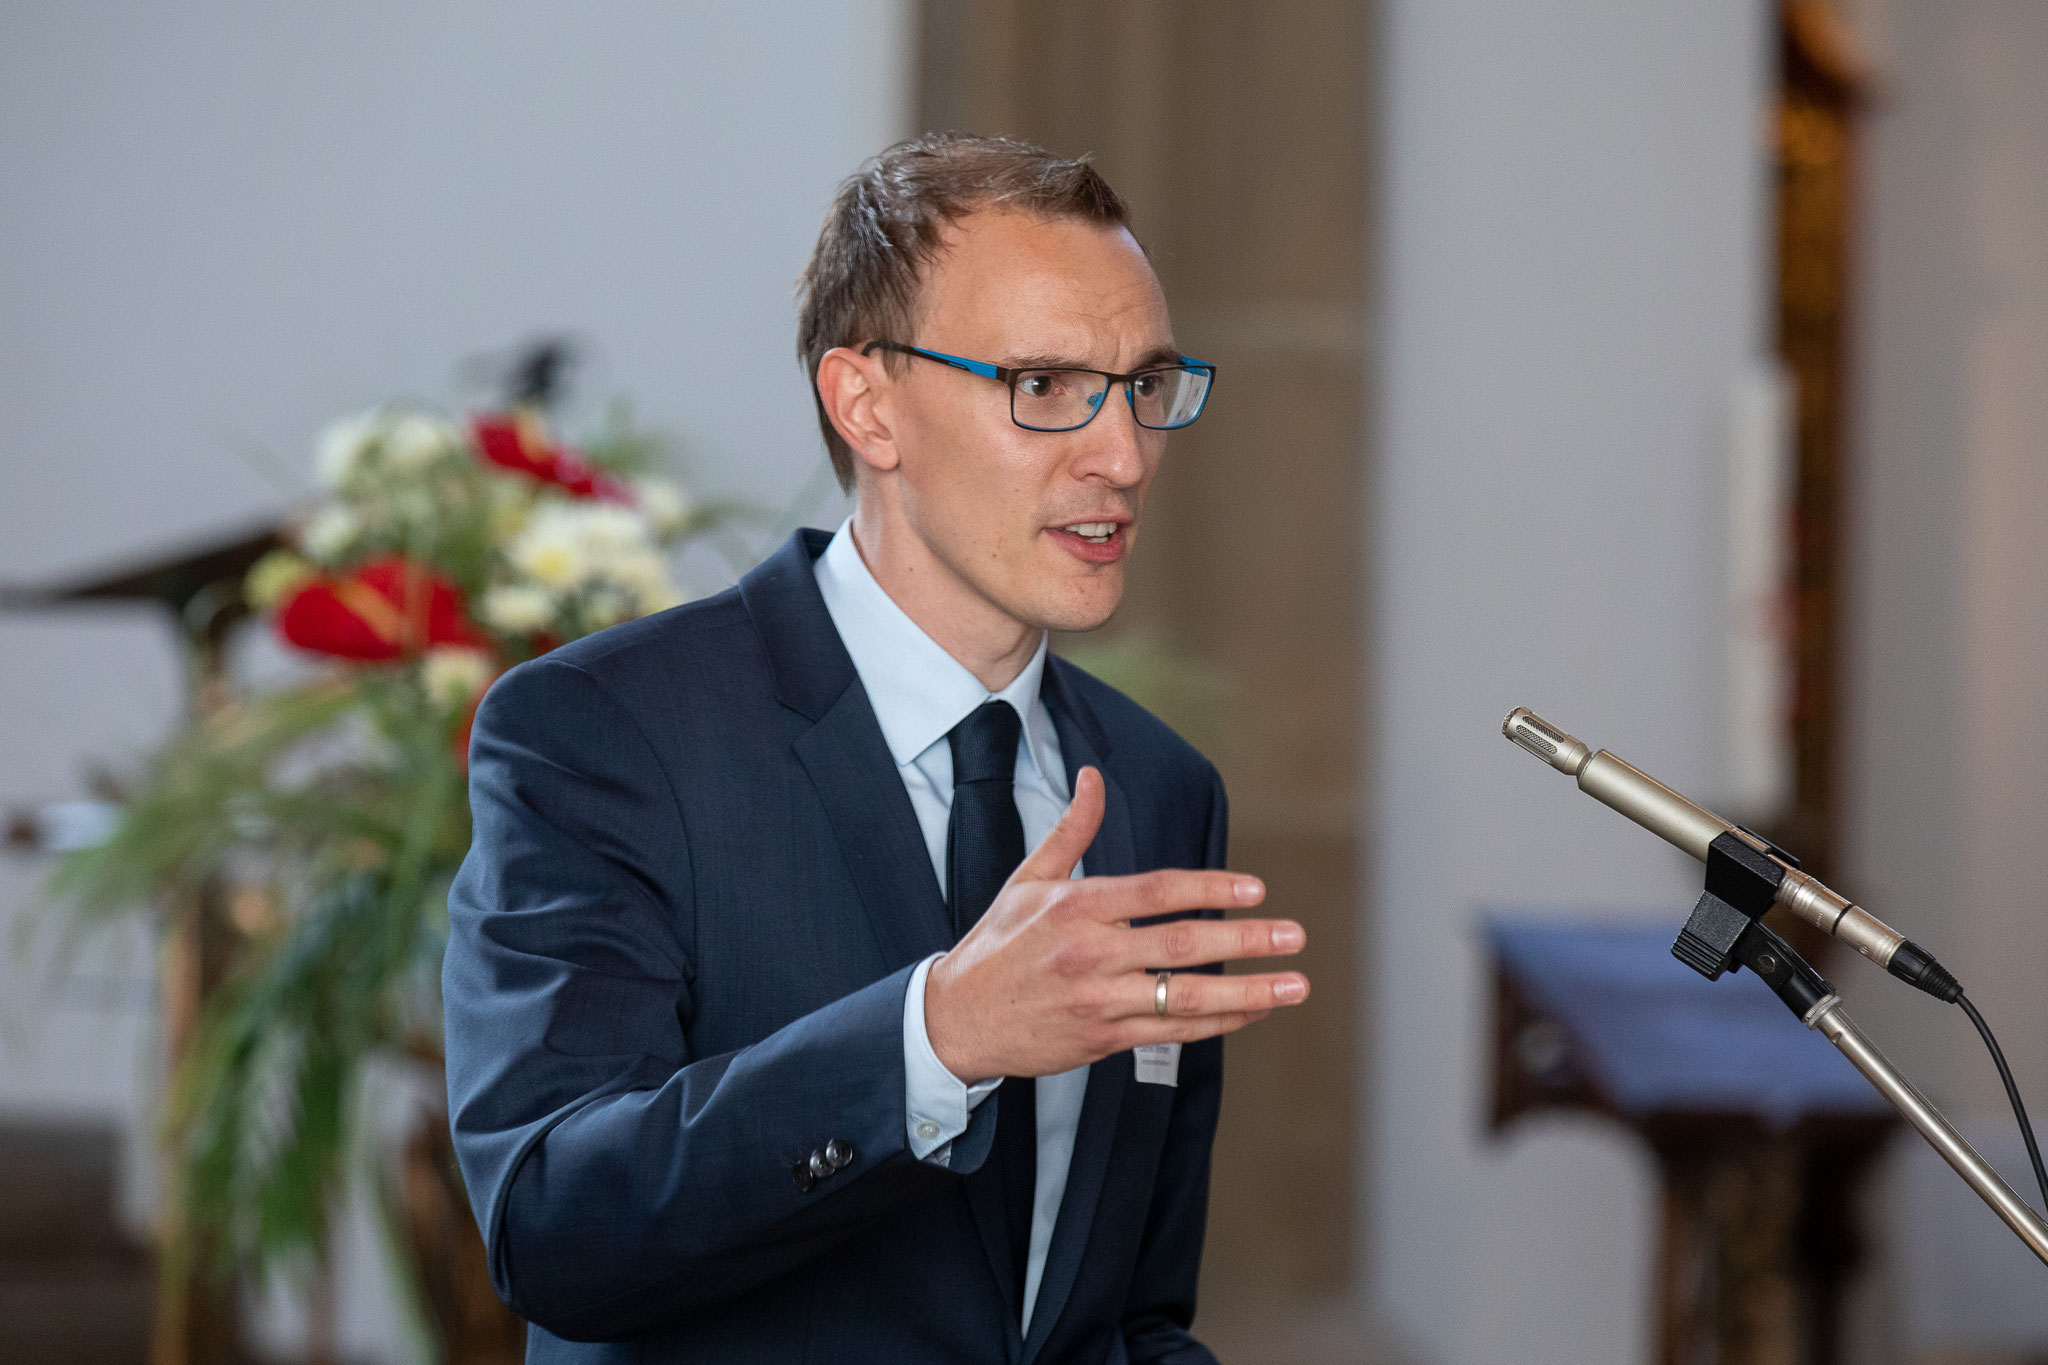 Katholikenratsvorsitzender Daniel Wörmann   © Achim Pohl I Bistum Essen